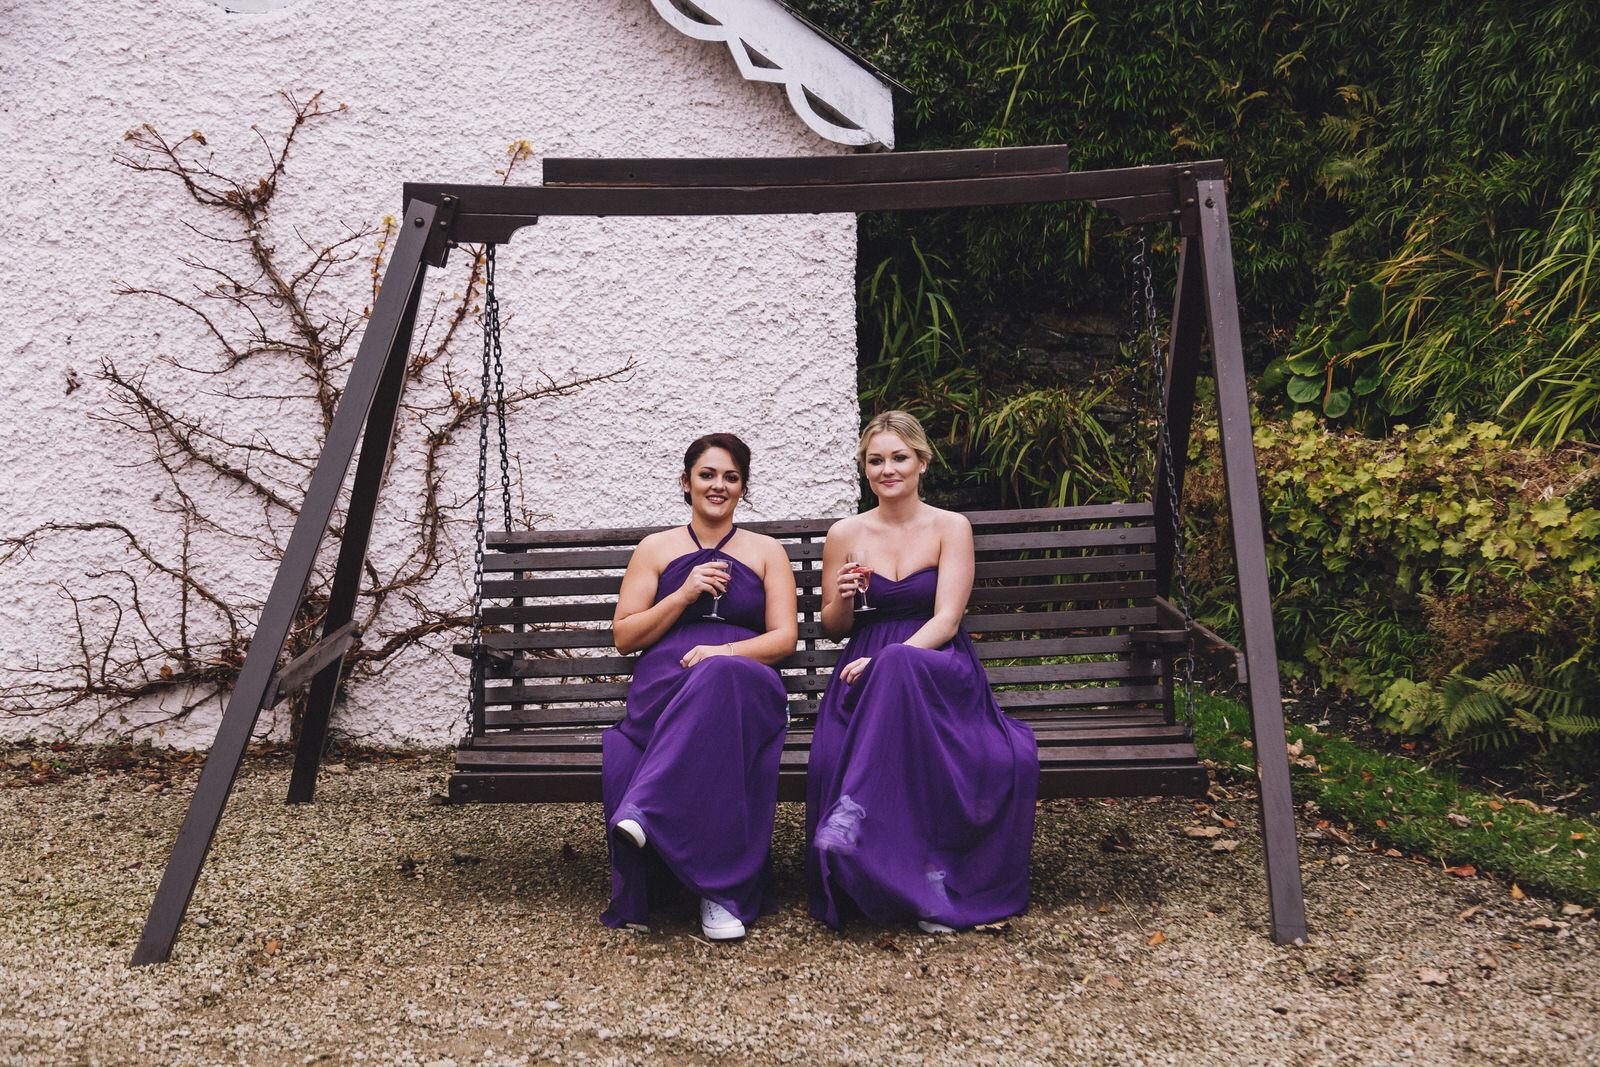 Balybeg-house-ireland-wicklow-wedding-photographer-roger-kenny_greystones083.jpg